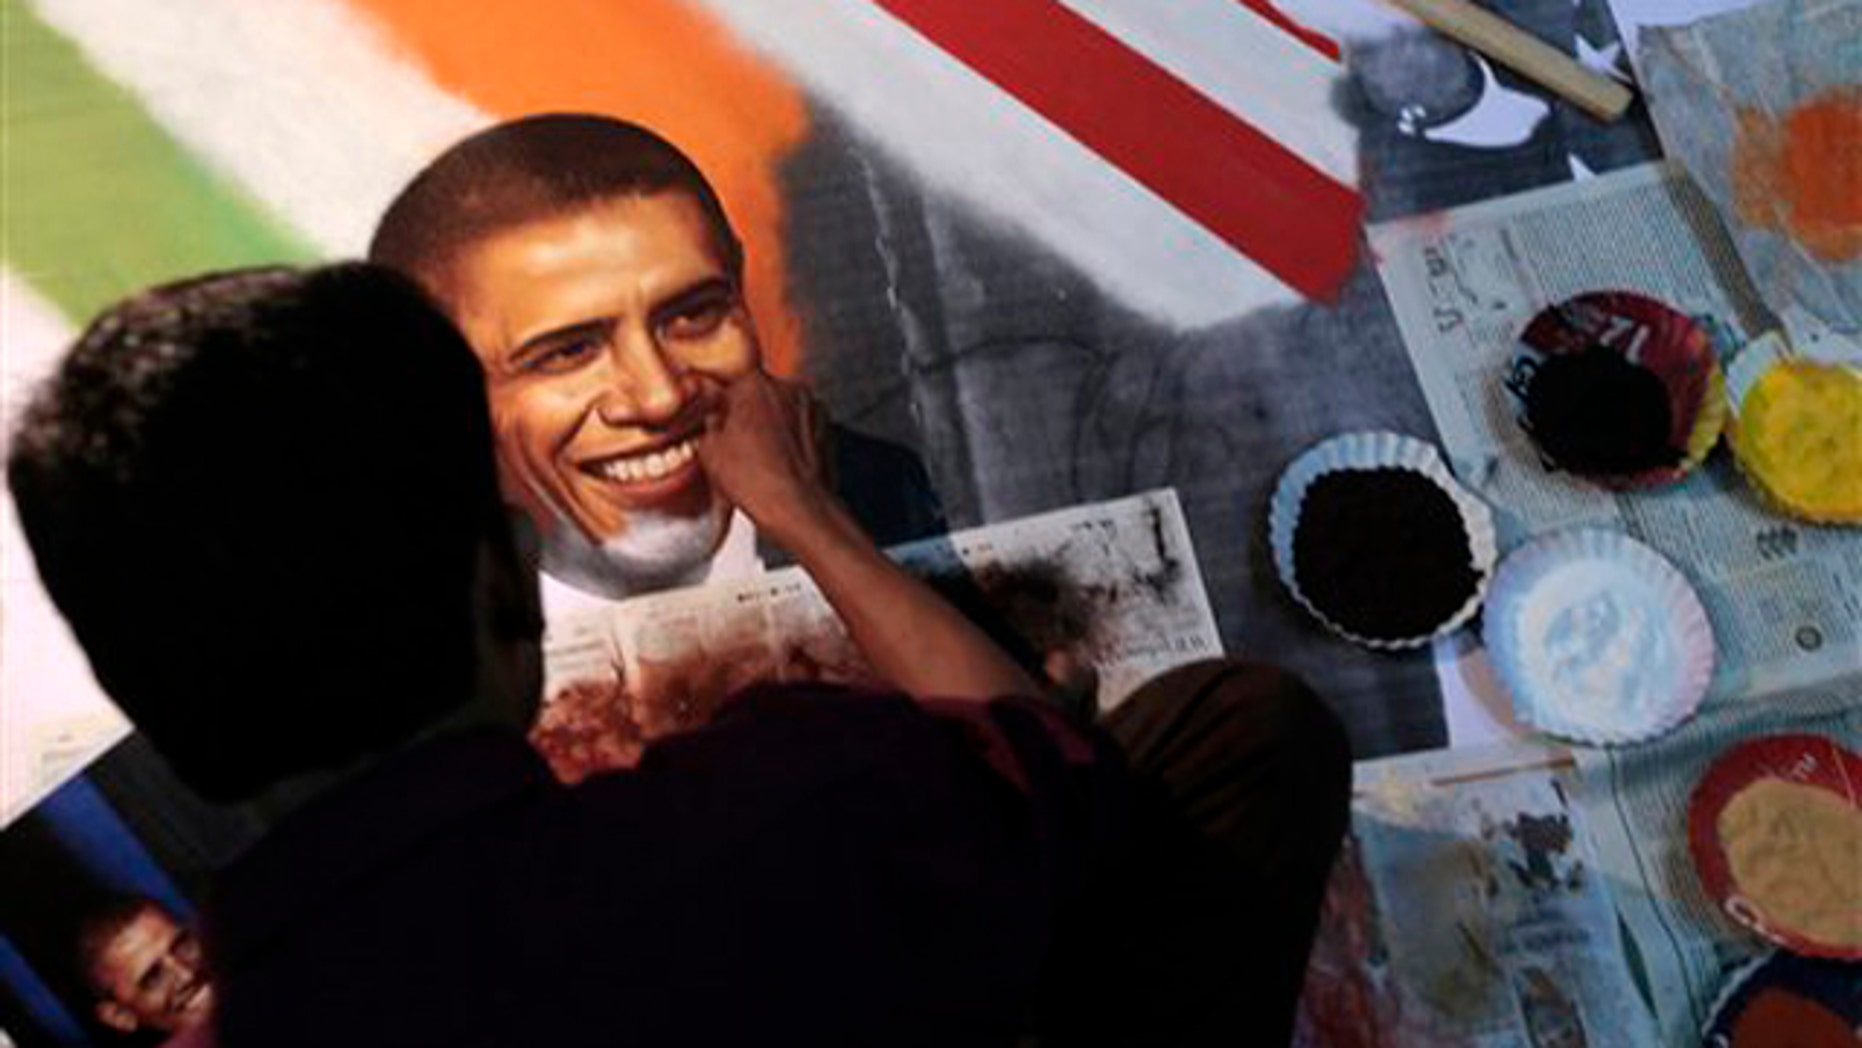 Nov. 4: An Indian artist makes an art piece depicting President Obama at a studio in Thane, near Mumbai.